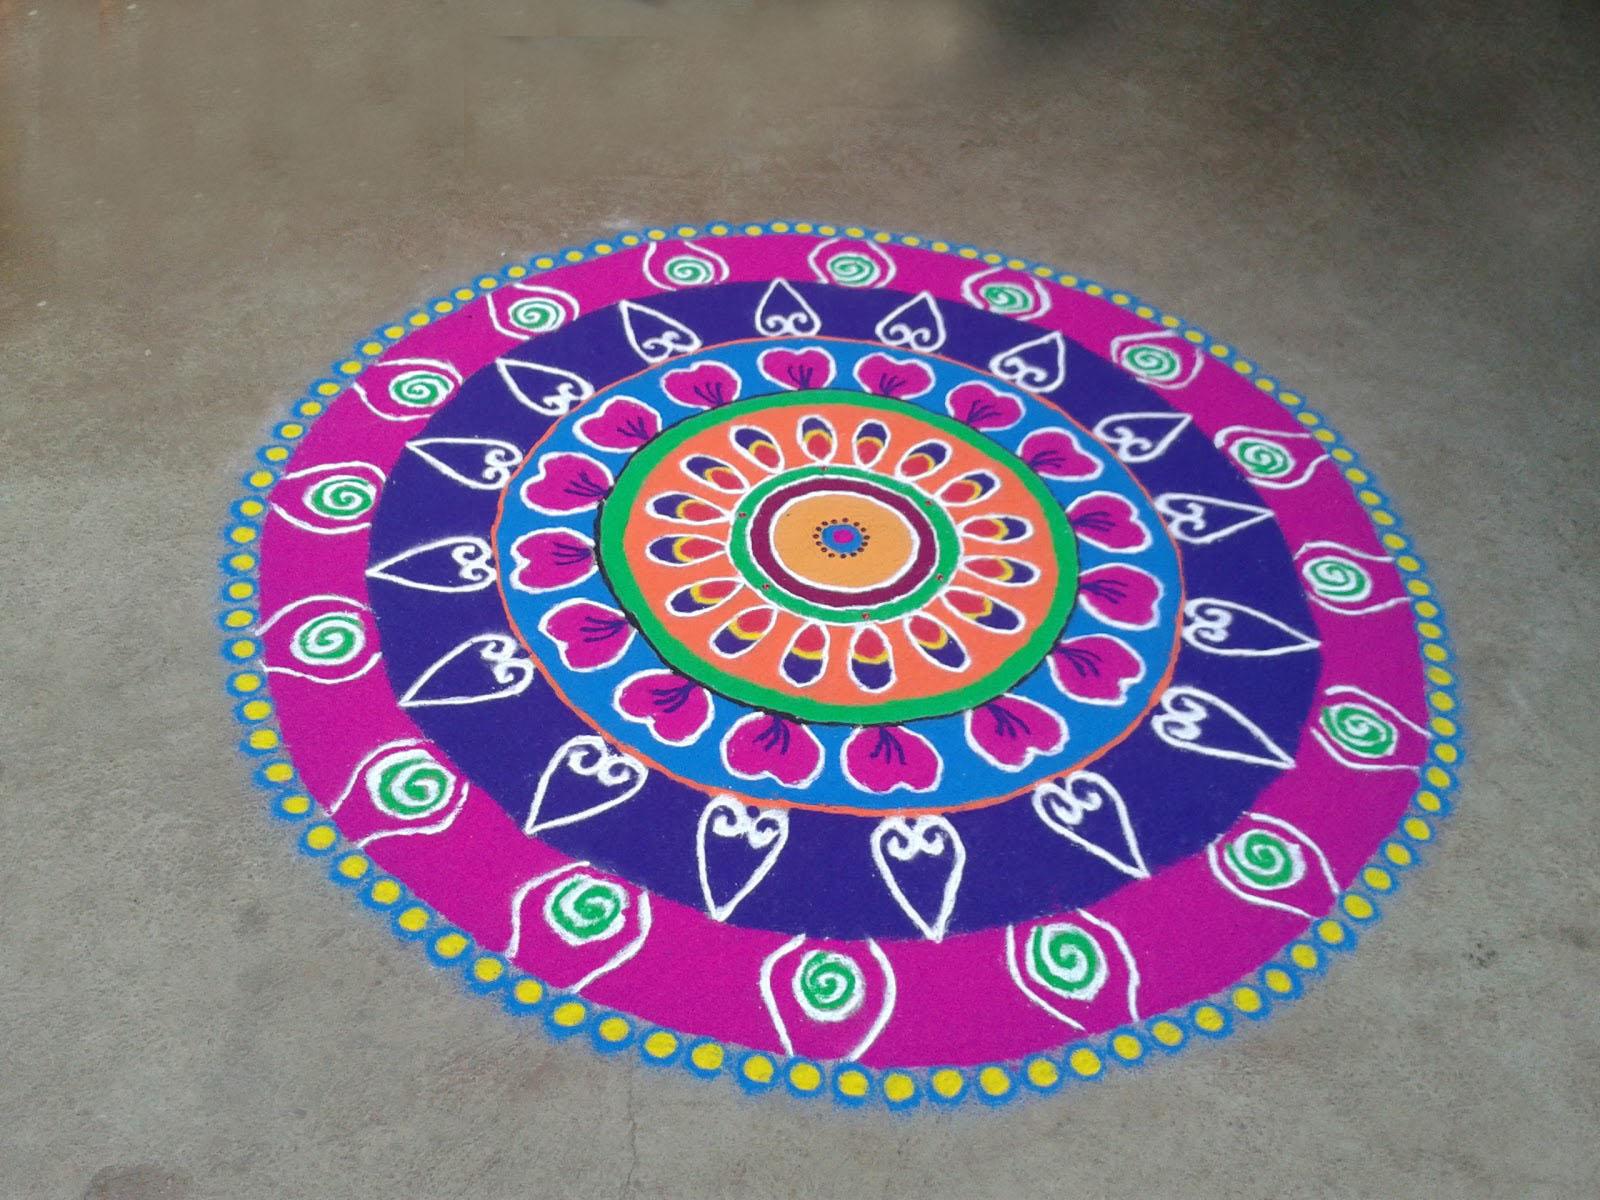 Rangoli Designs for Diwali 2016 - Free Hand Rangoli with Colors